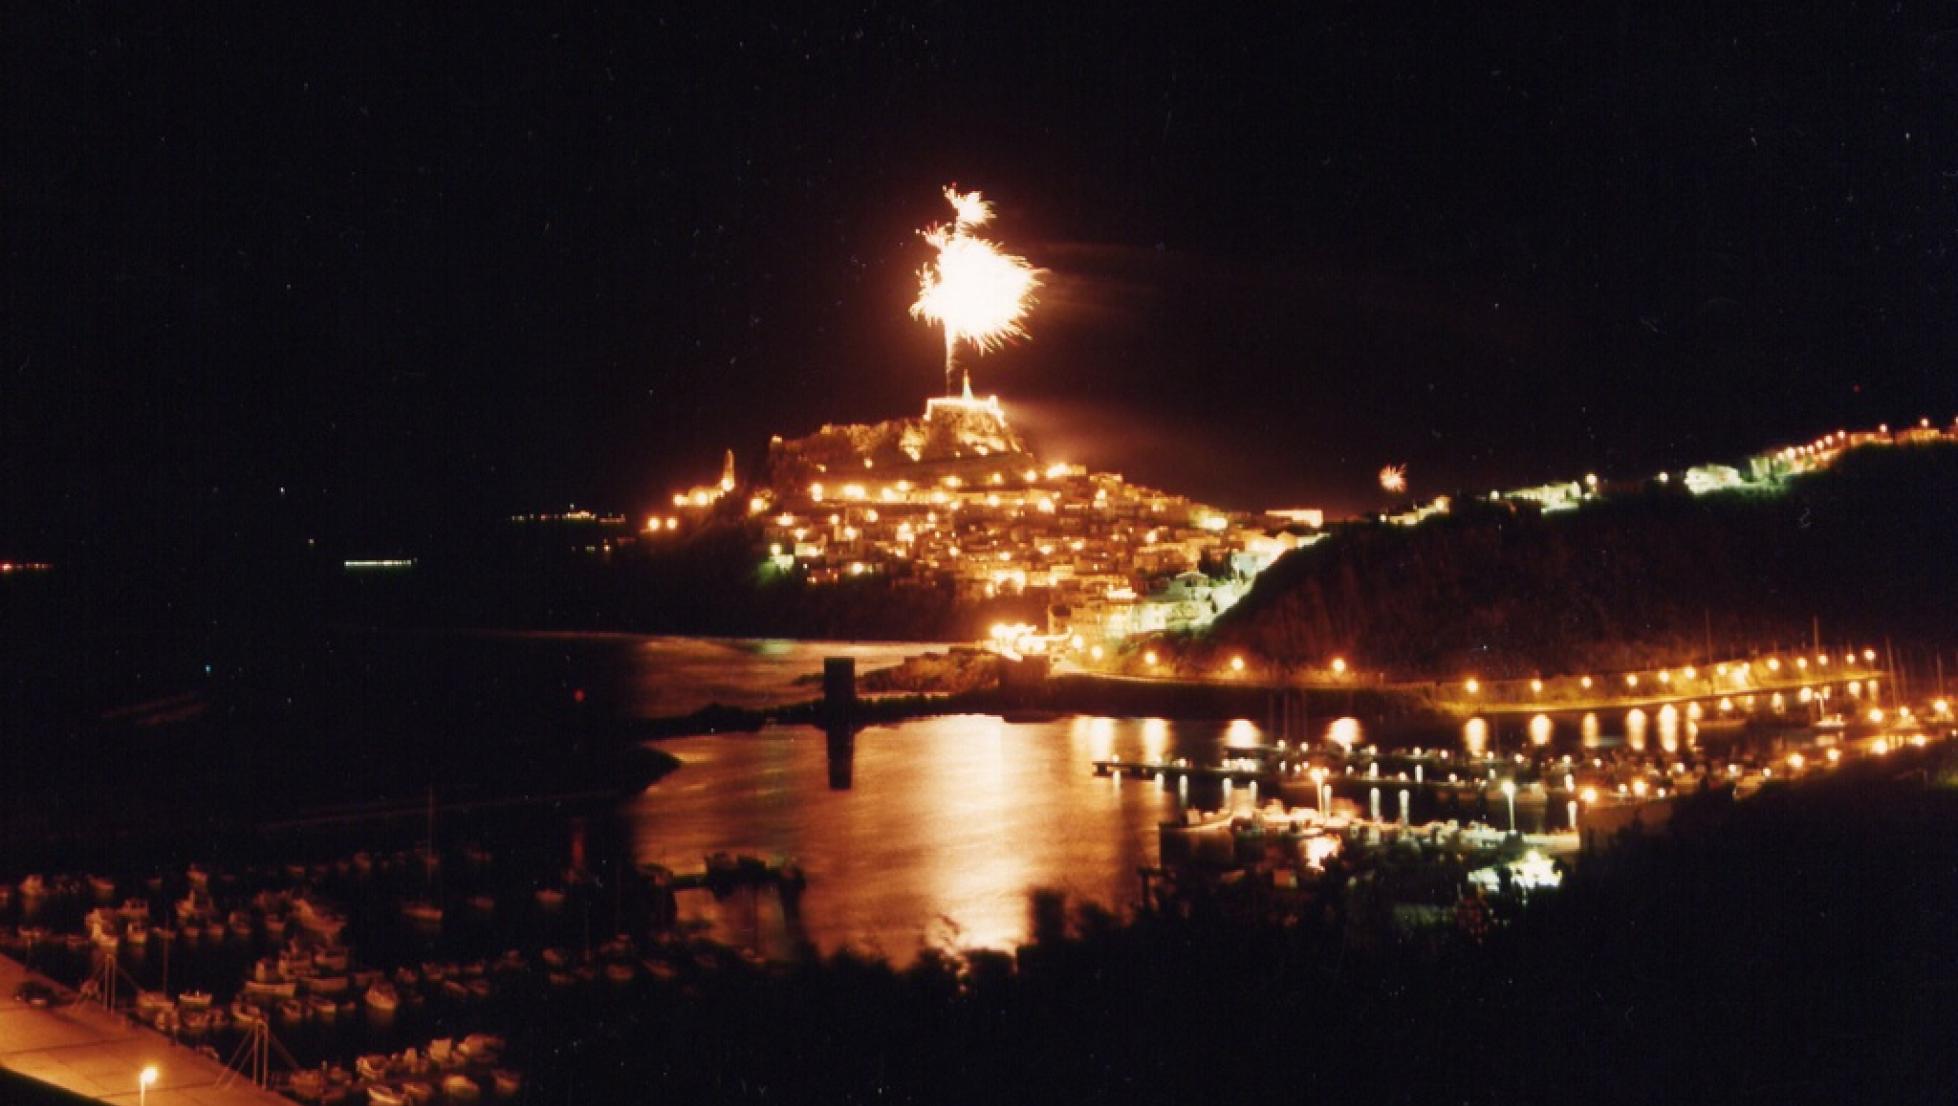 Capodanno, fuochi d'artificio - Castelsardo